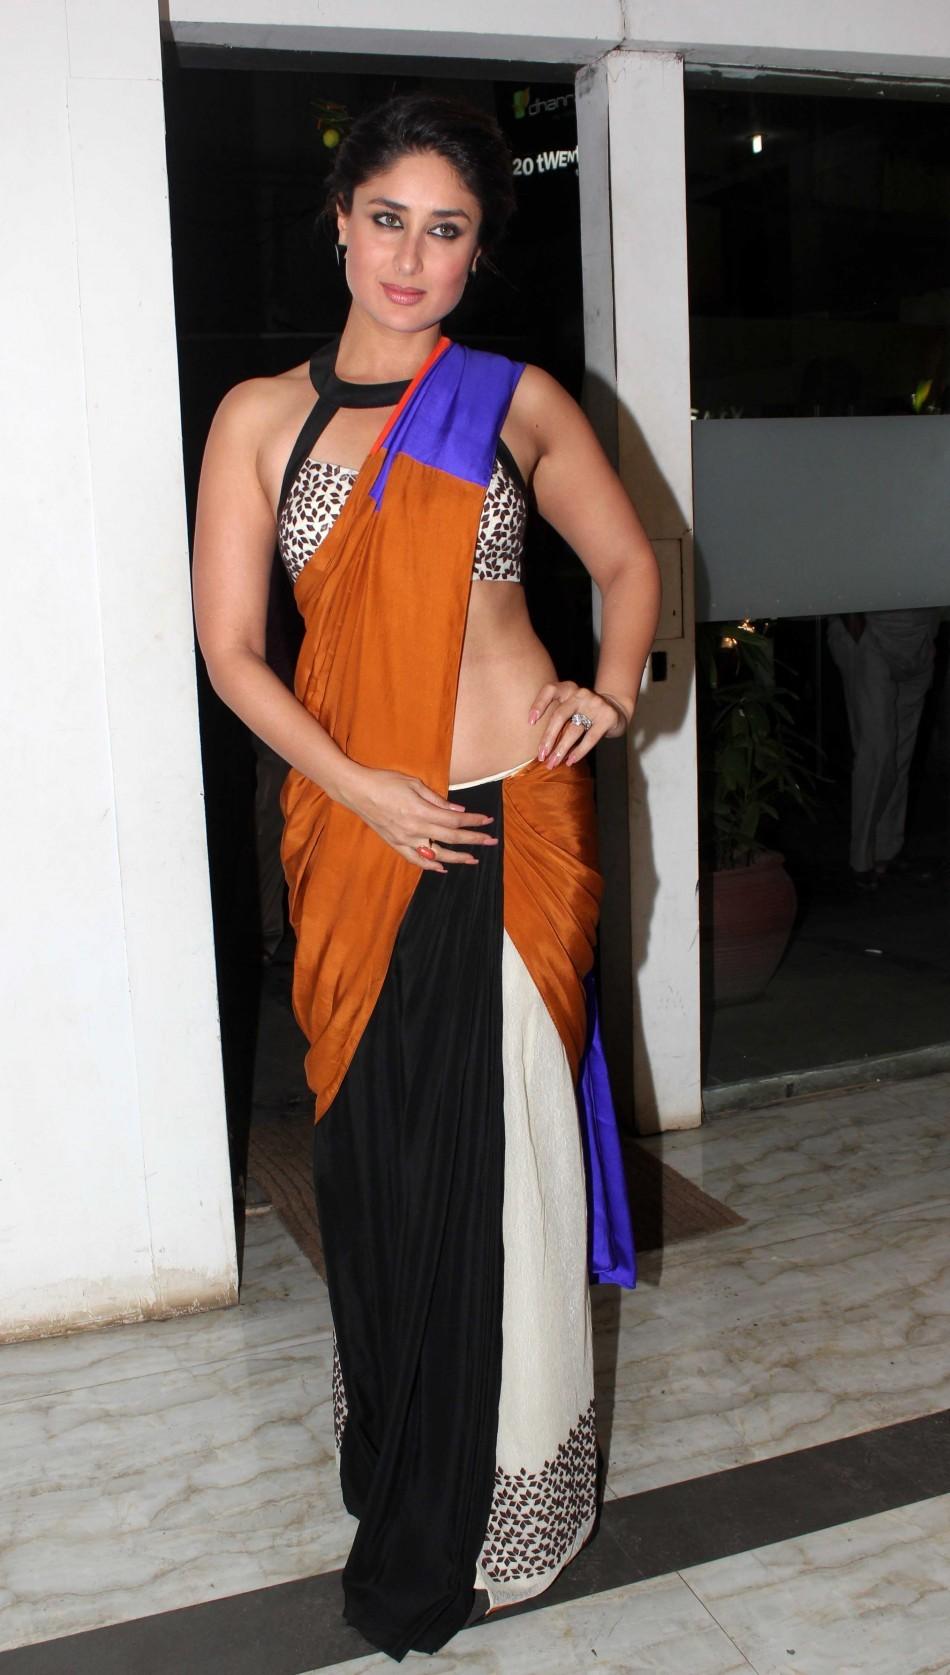 Kareena Kapoor Graces Filmfare Cover In Mini Skirt Looks Glamorous At Magazine Launch Event